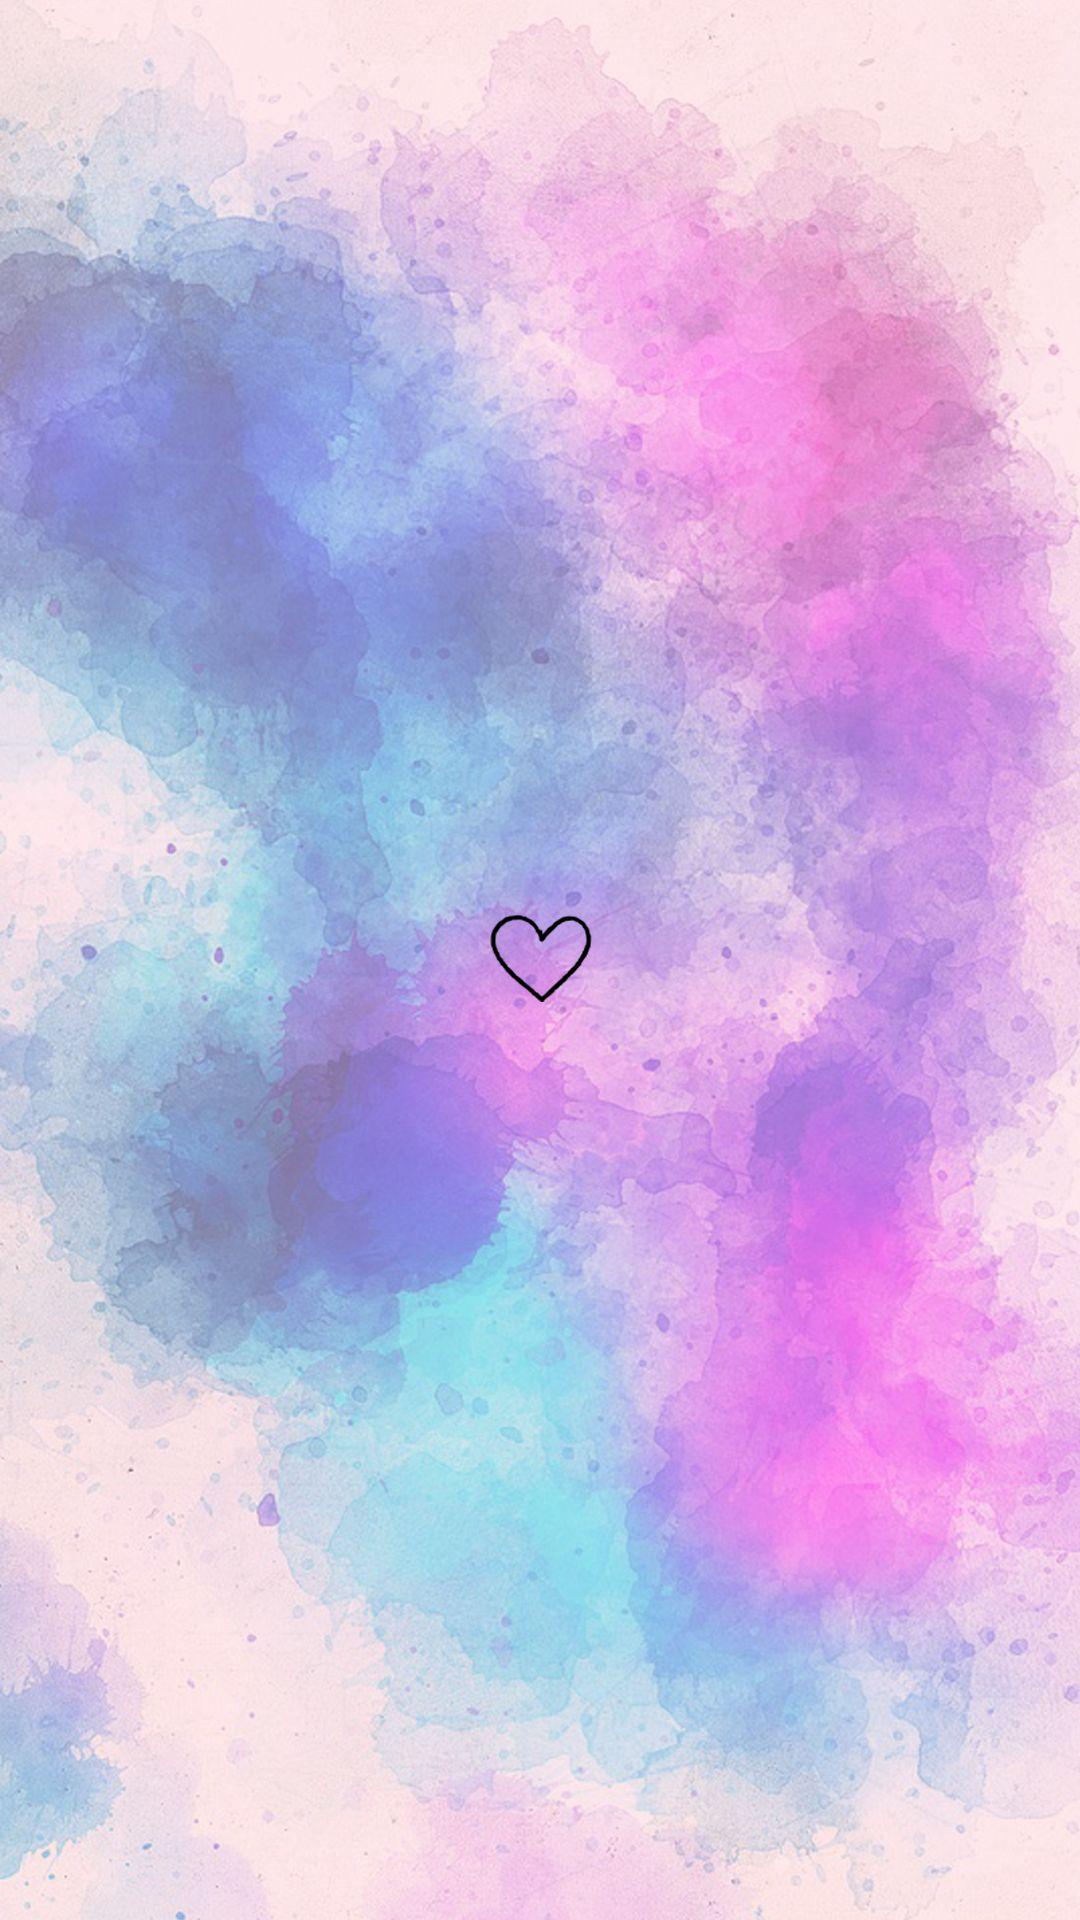 Sodastream | Iconos Instagram | Pinterest | Fondo pantalla celular, Pantalla y Fondos de ...